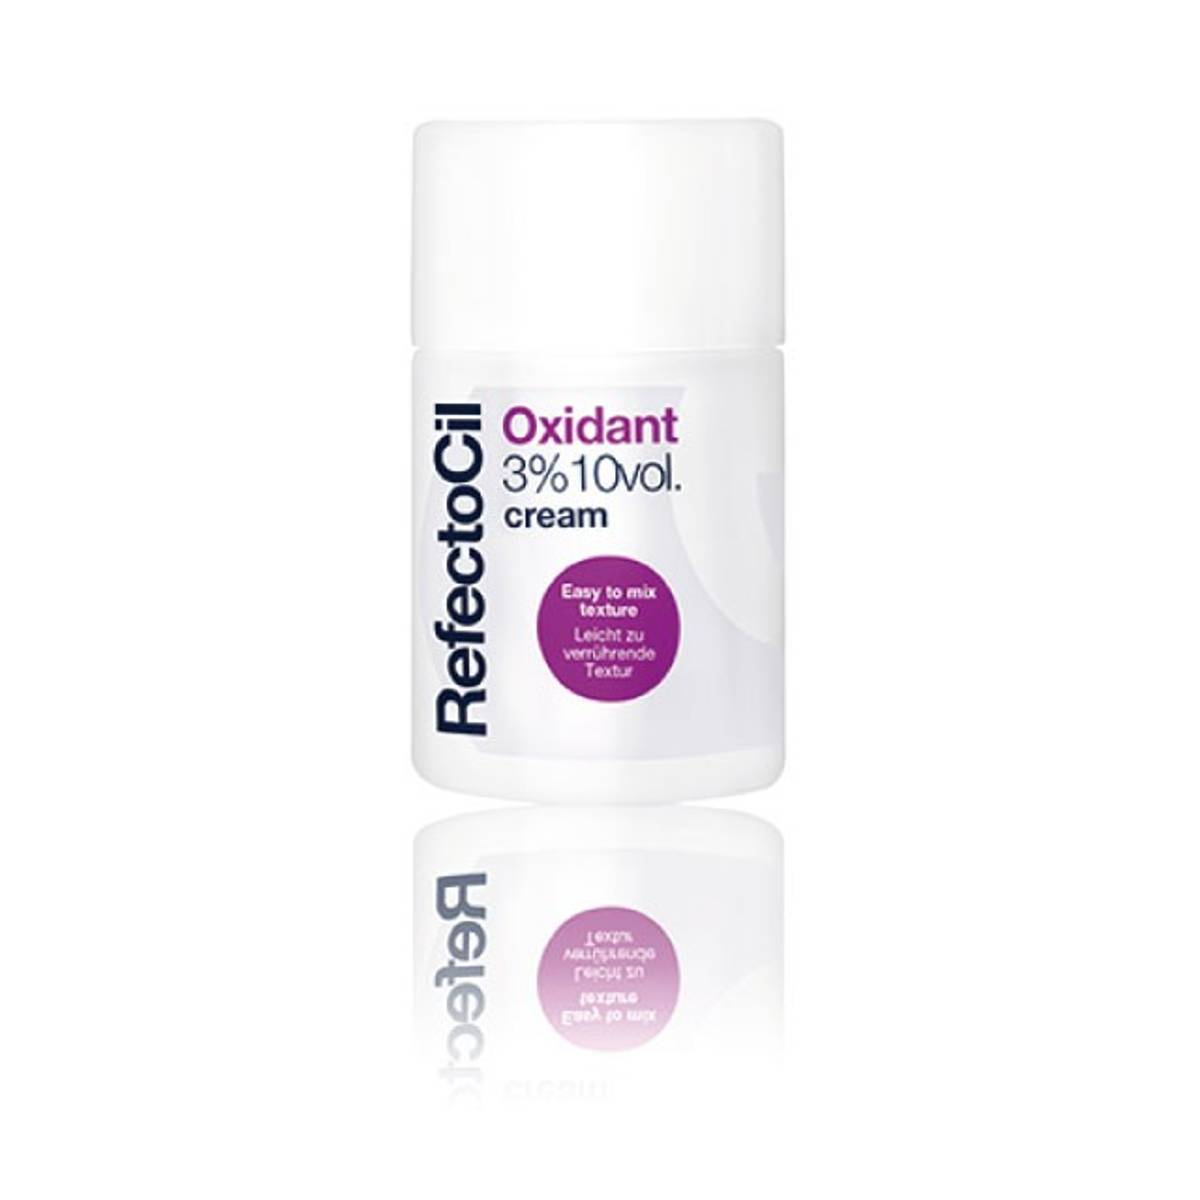 Refectocil Oxidant 3% Creme 100 ml